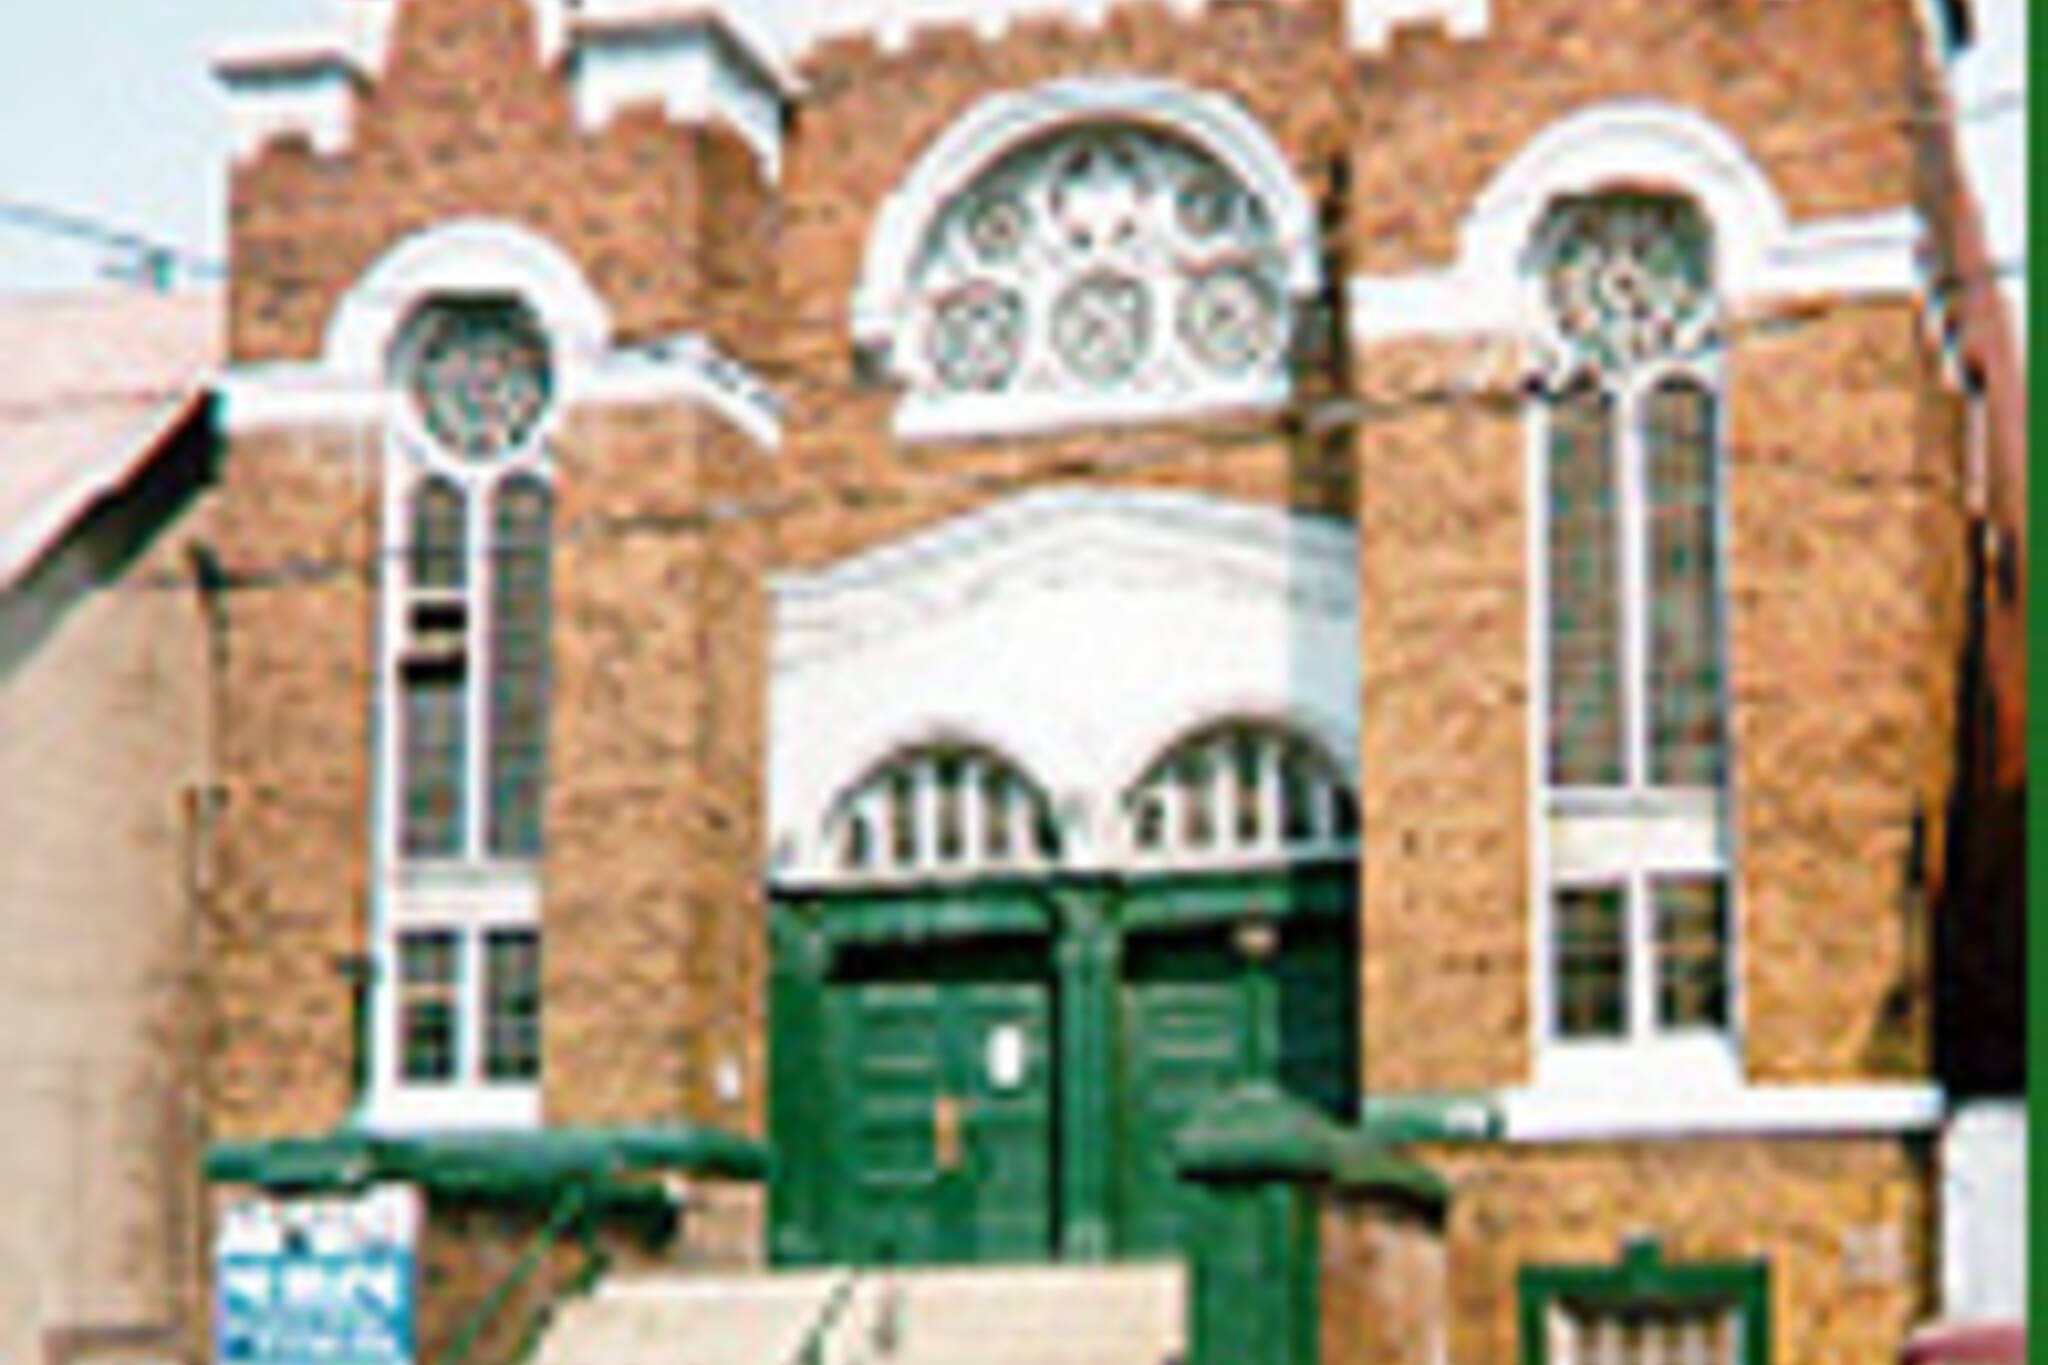 Kensington Market's historic Anshei Minsk shul.  Image from www.openair.org